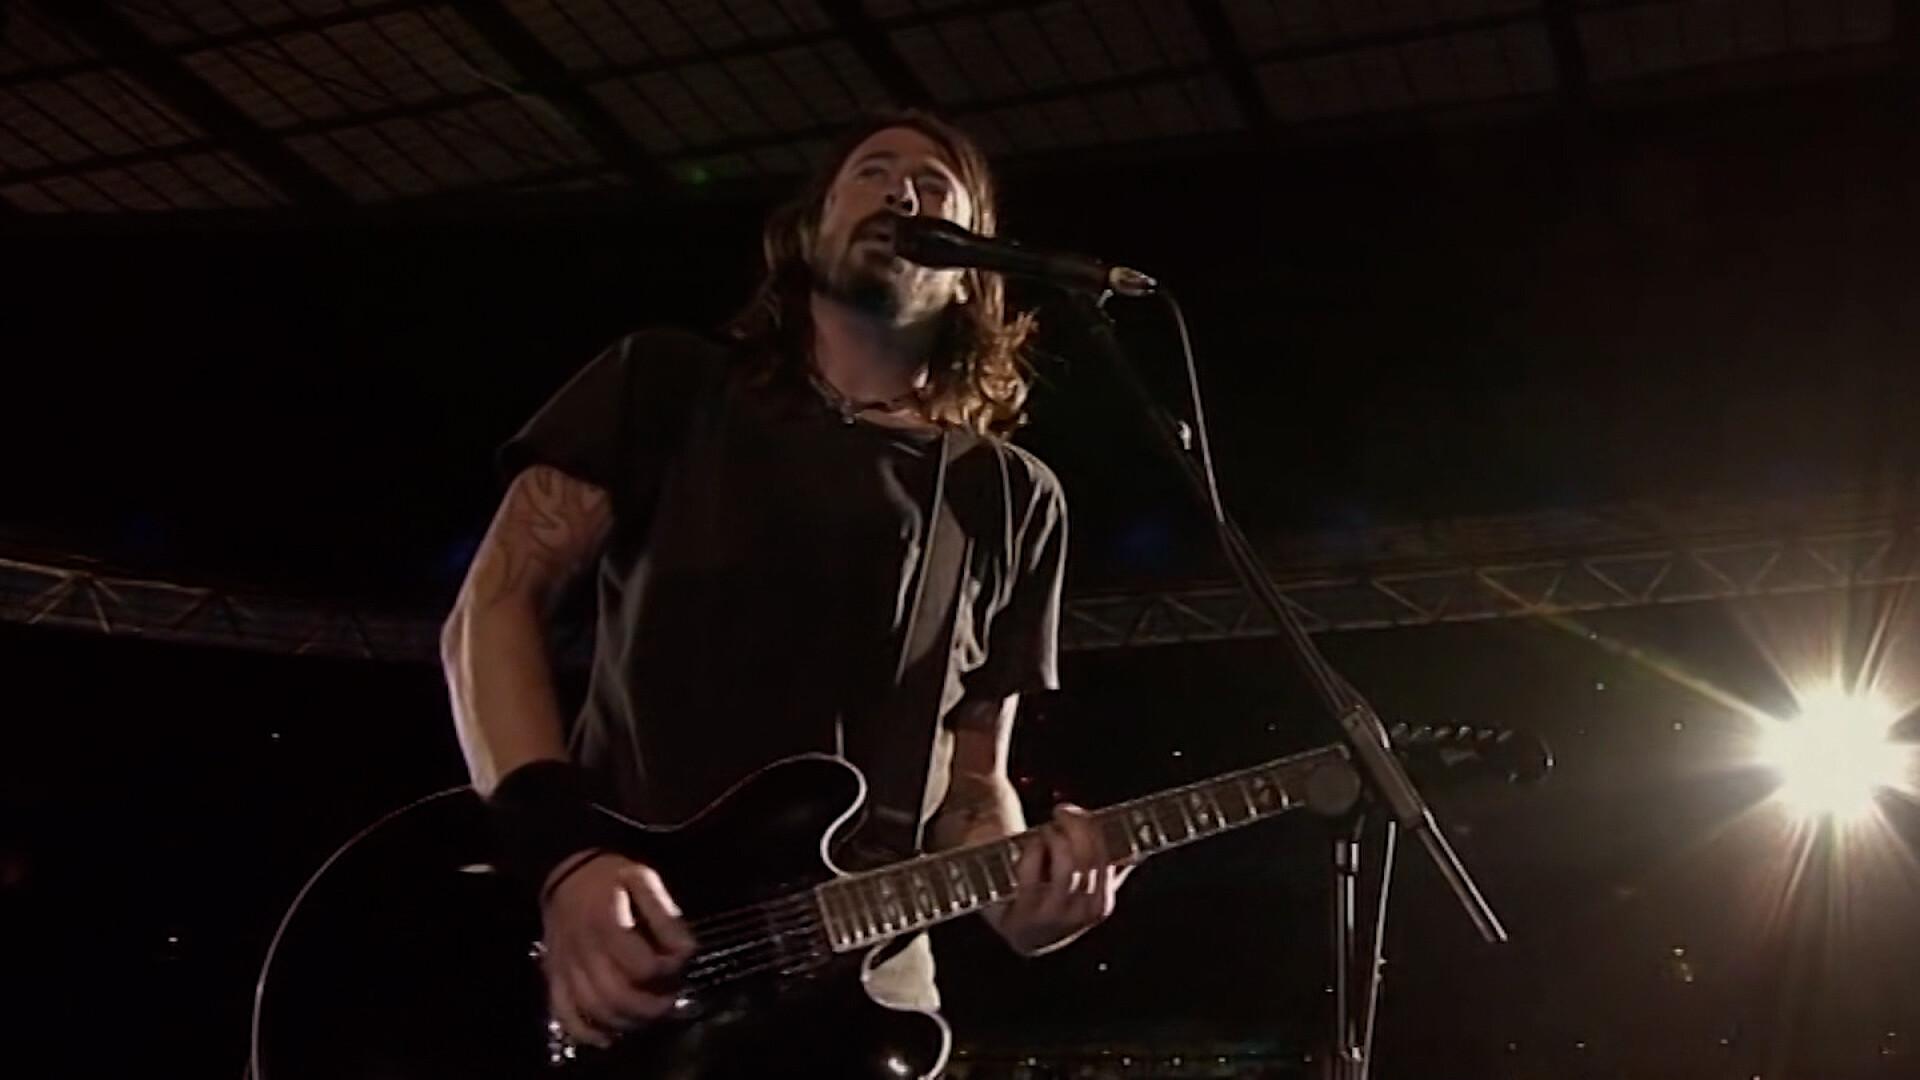 Foo Fighters postpone concert after confirmed Covid-19 case